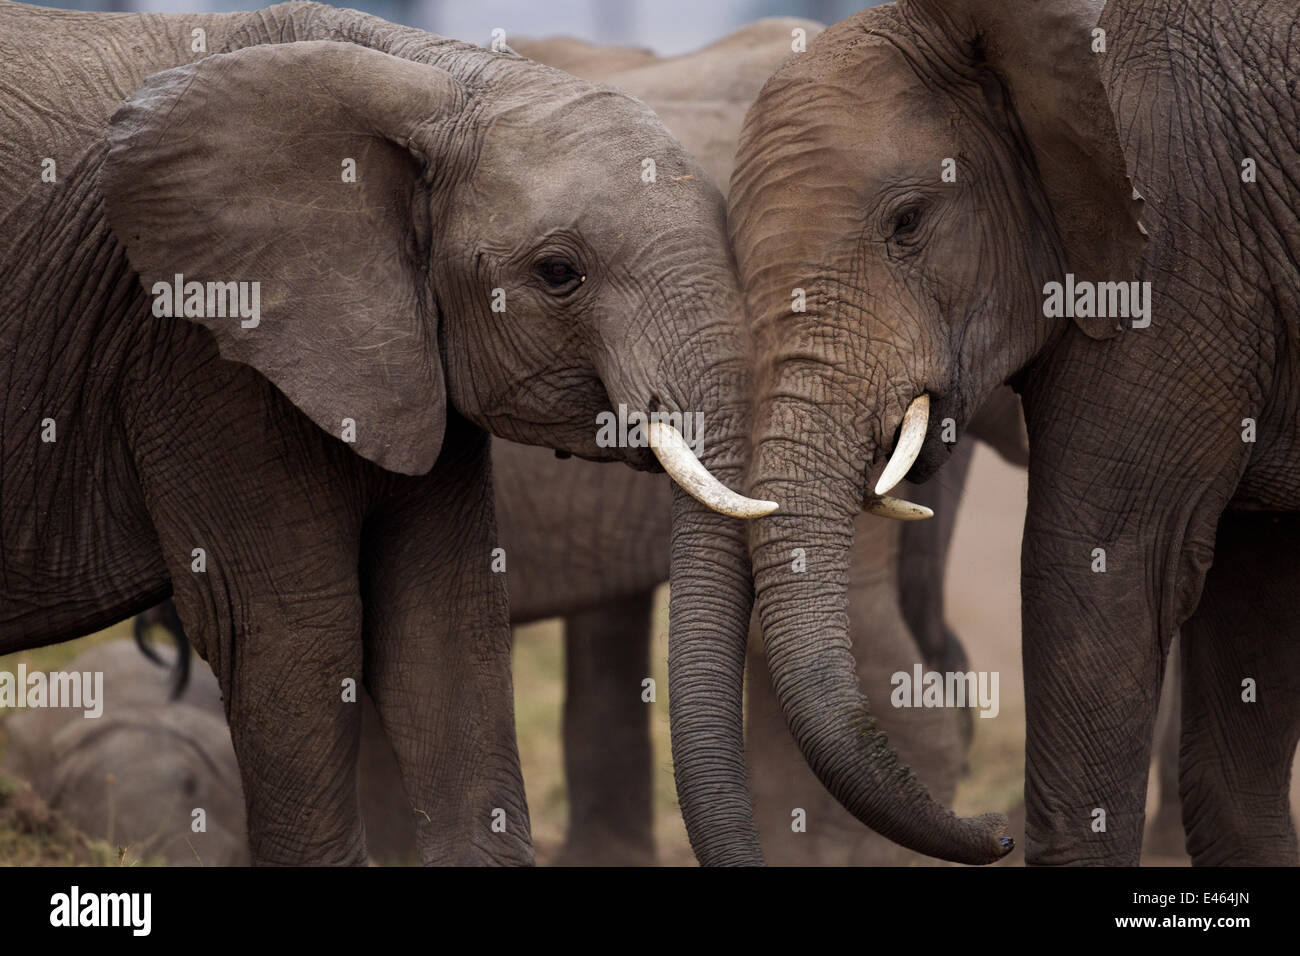 African elephants (Loxodonta africana) sparring, Masai Mara National Reserve, Kenya, August - Stock Image